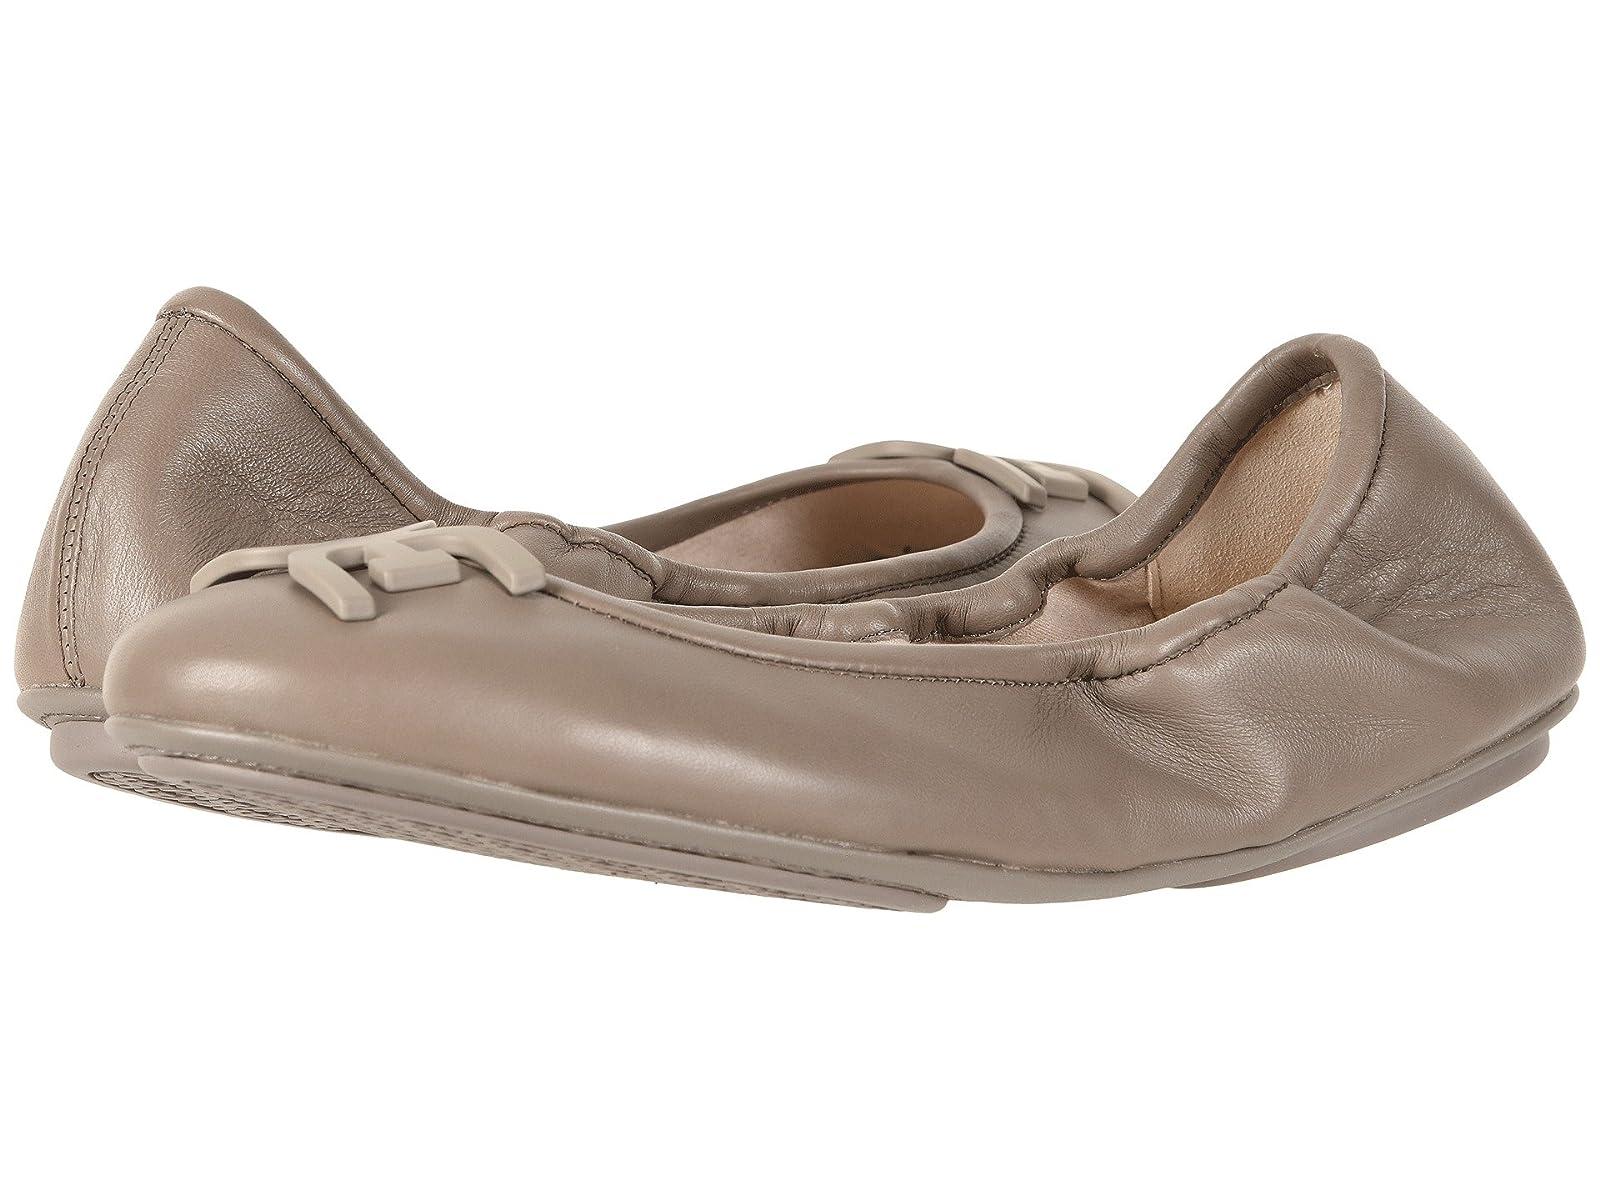 Sam Edelman FlorenceCheap and distinctive eye-catching shoes